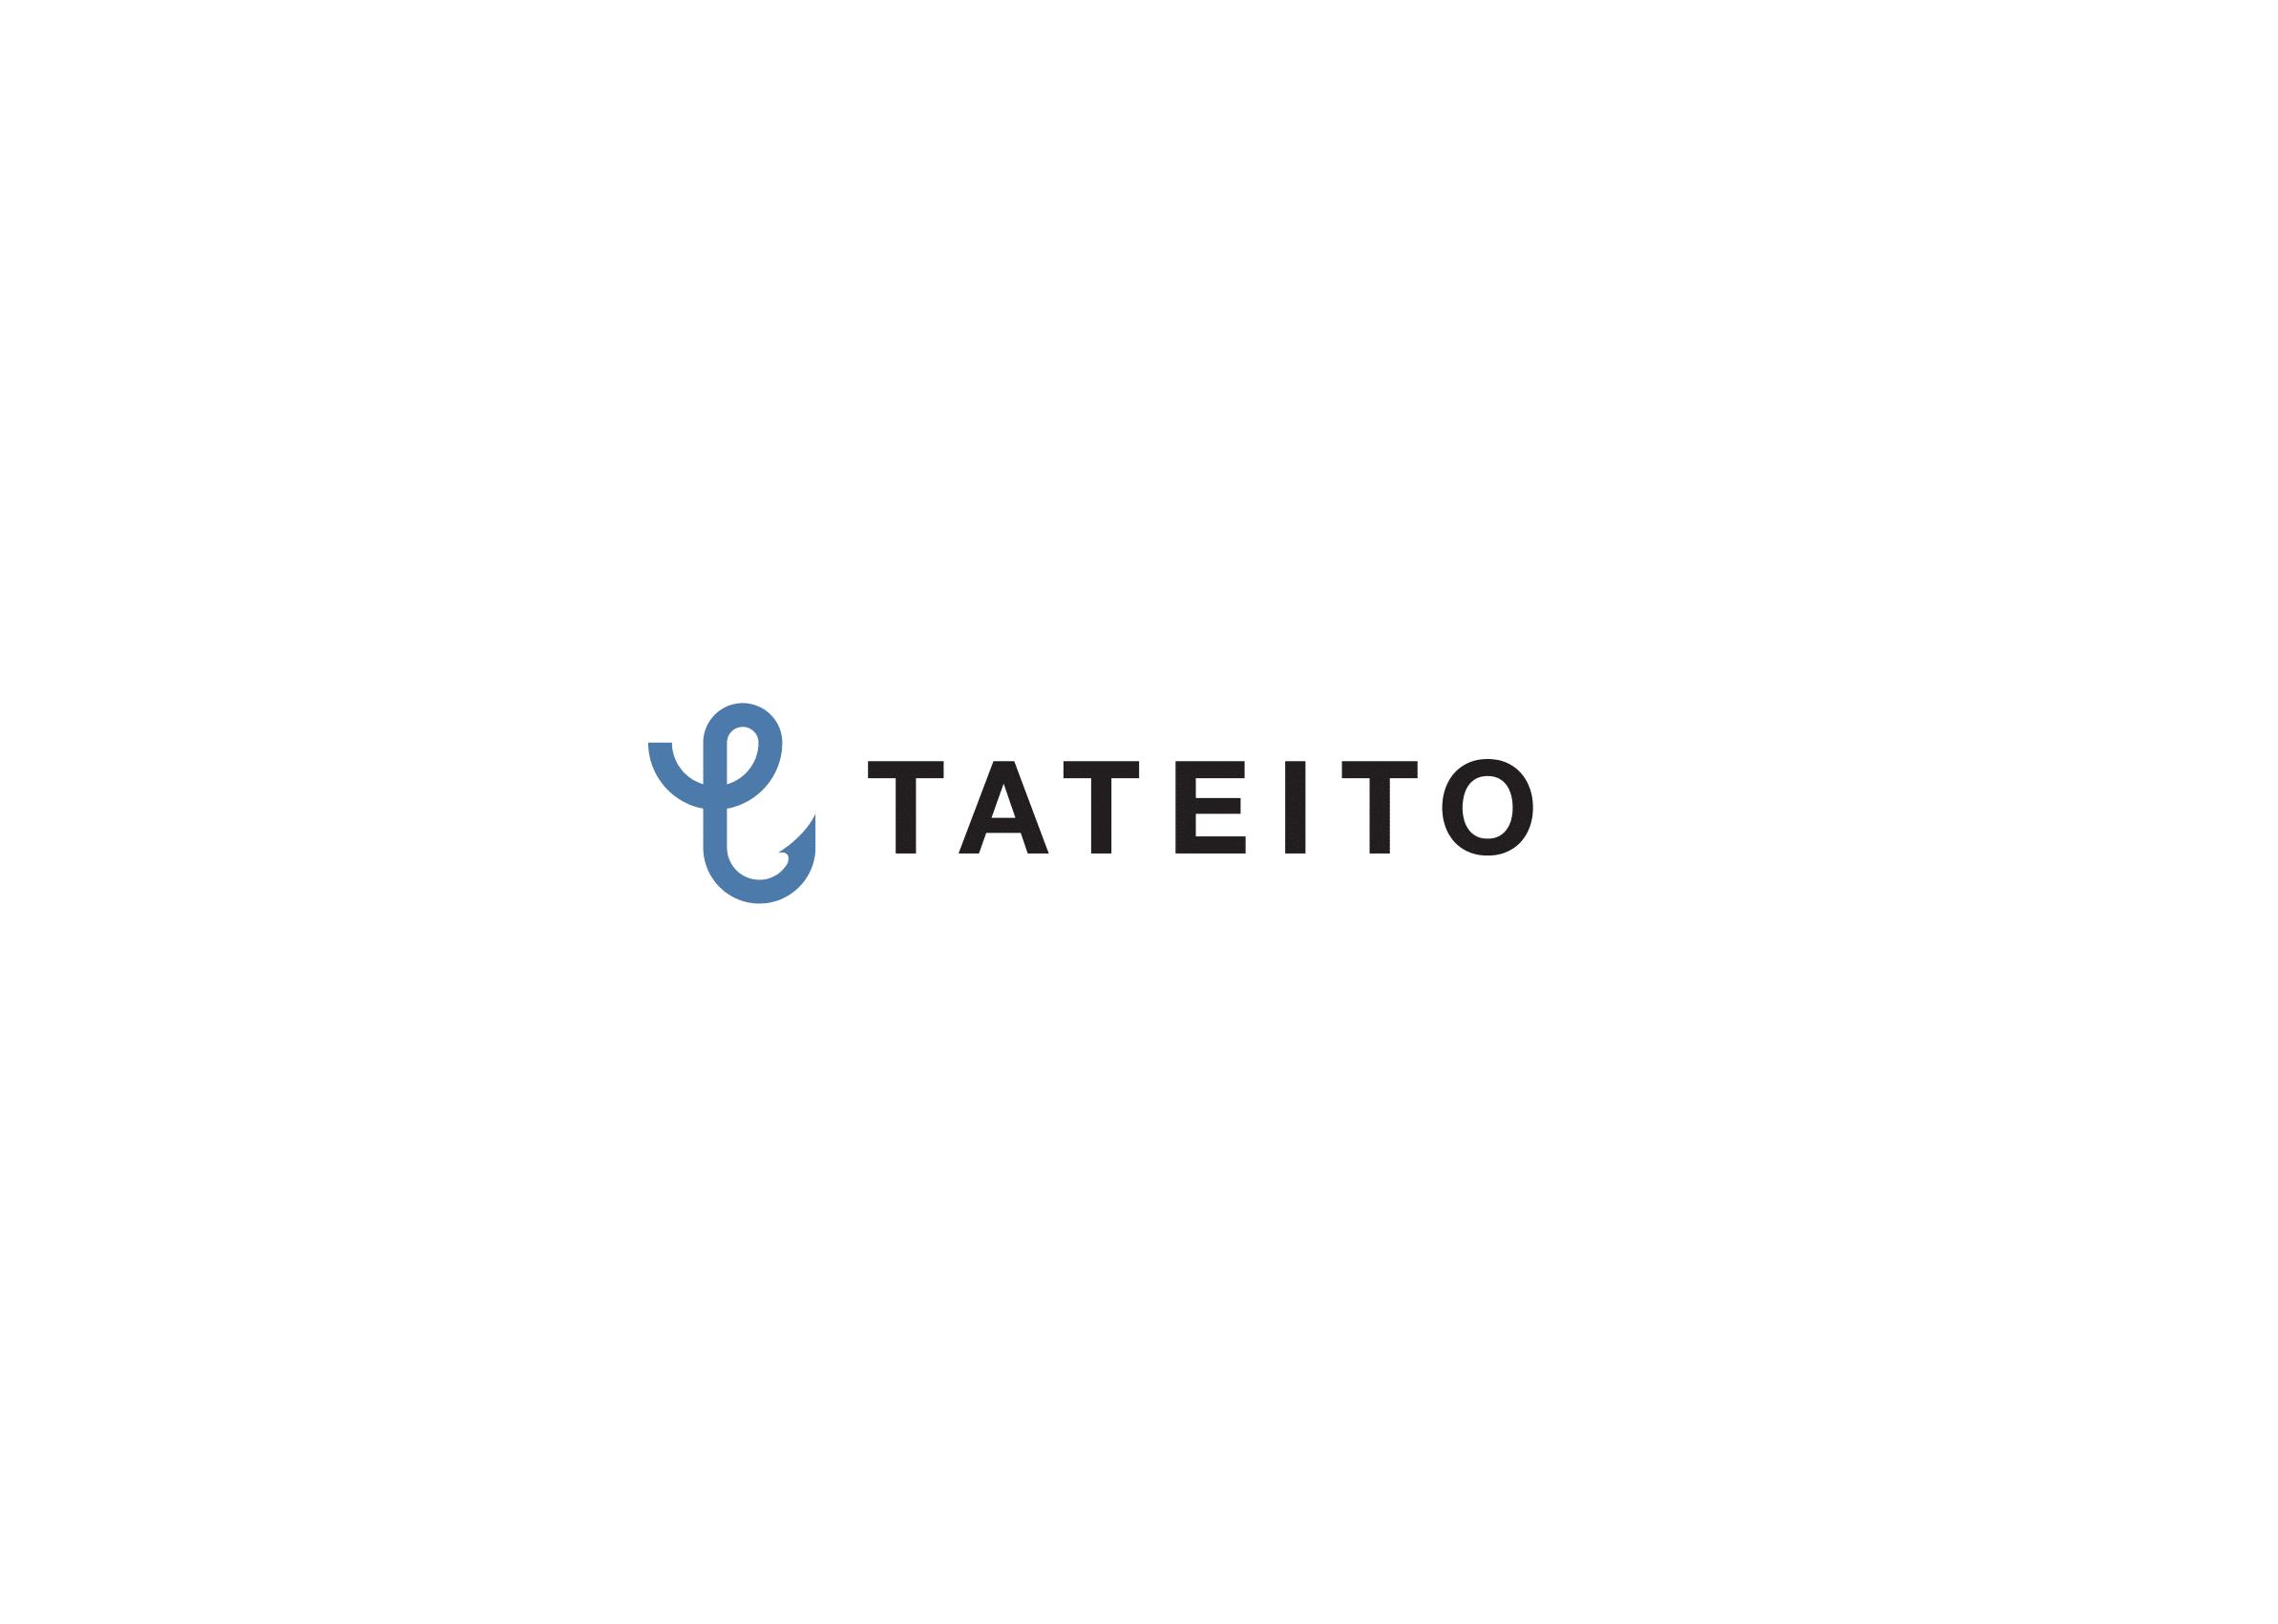 【研修事業】TATEITO構想